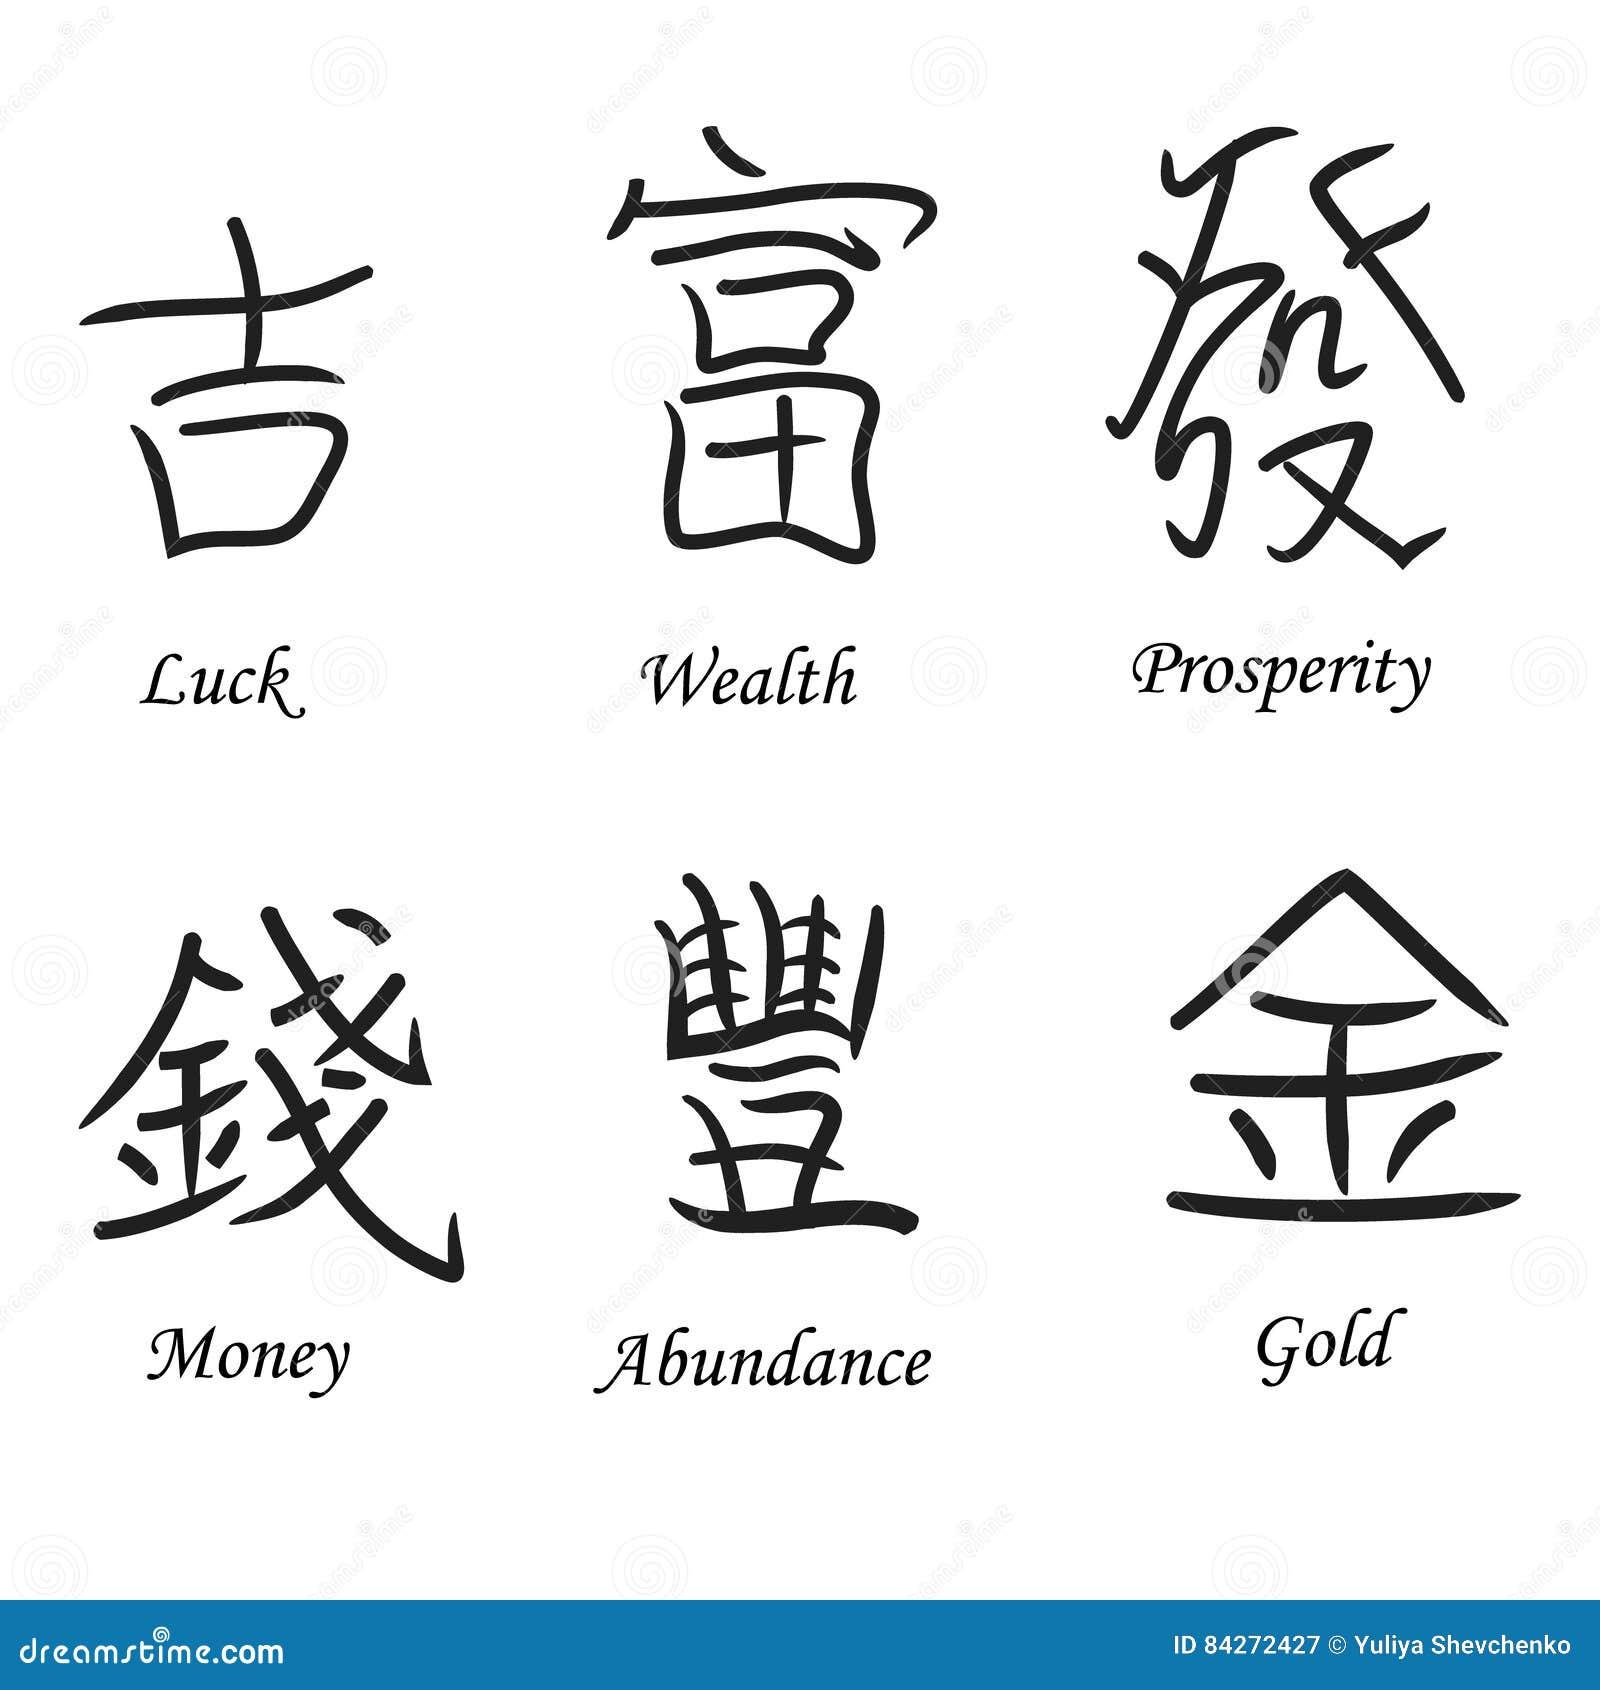 Hieroglyph of wealth and prosperity 27